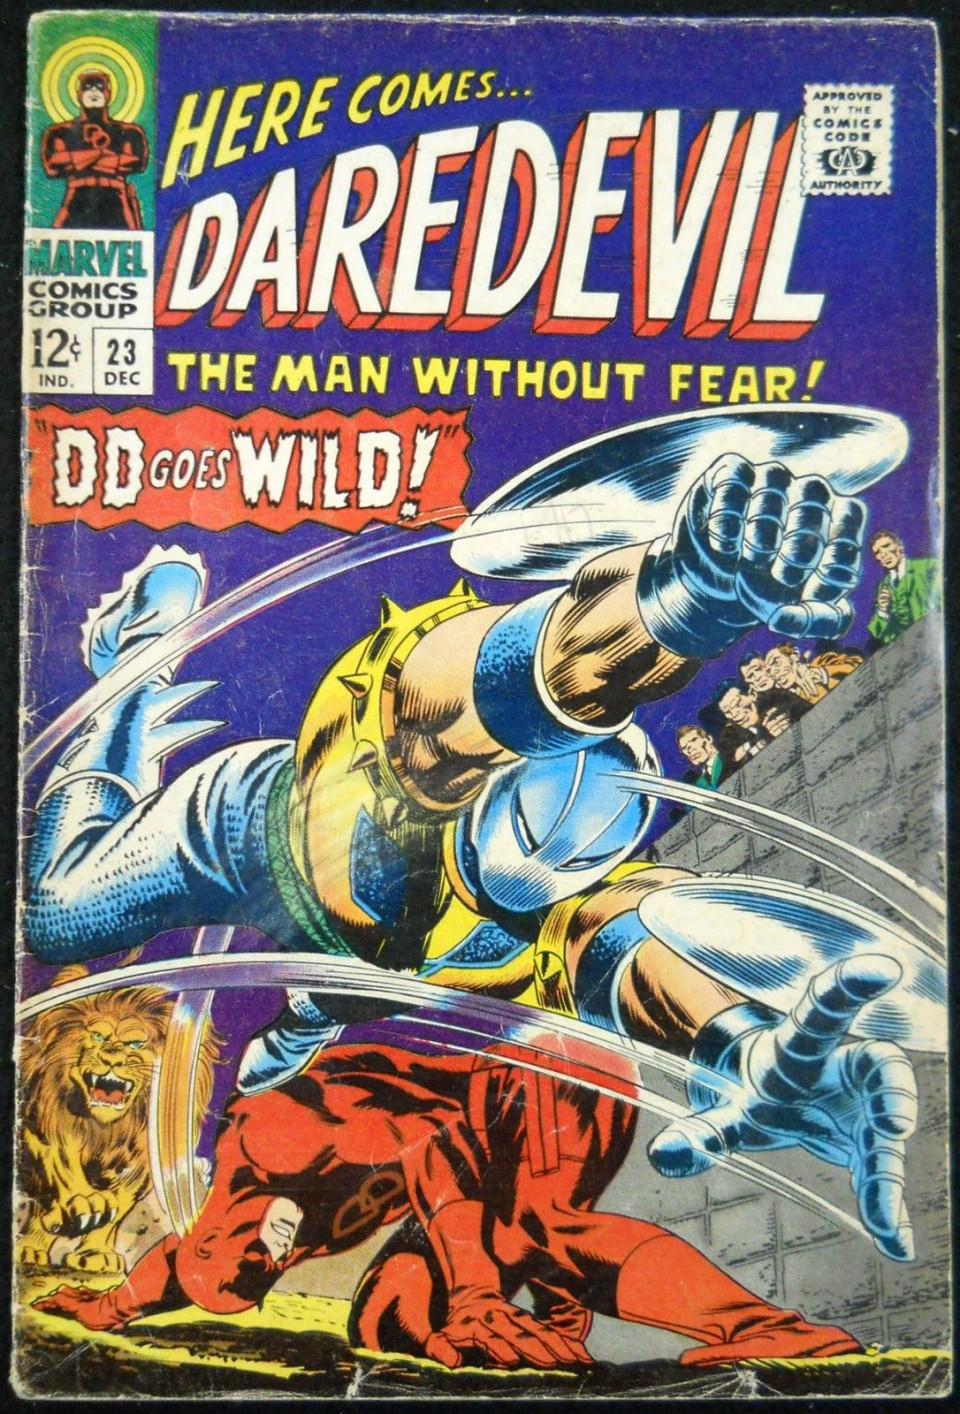 Daredevil 23 - cover art by Gene Colan